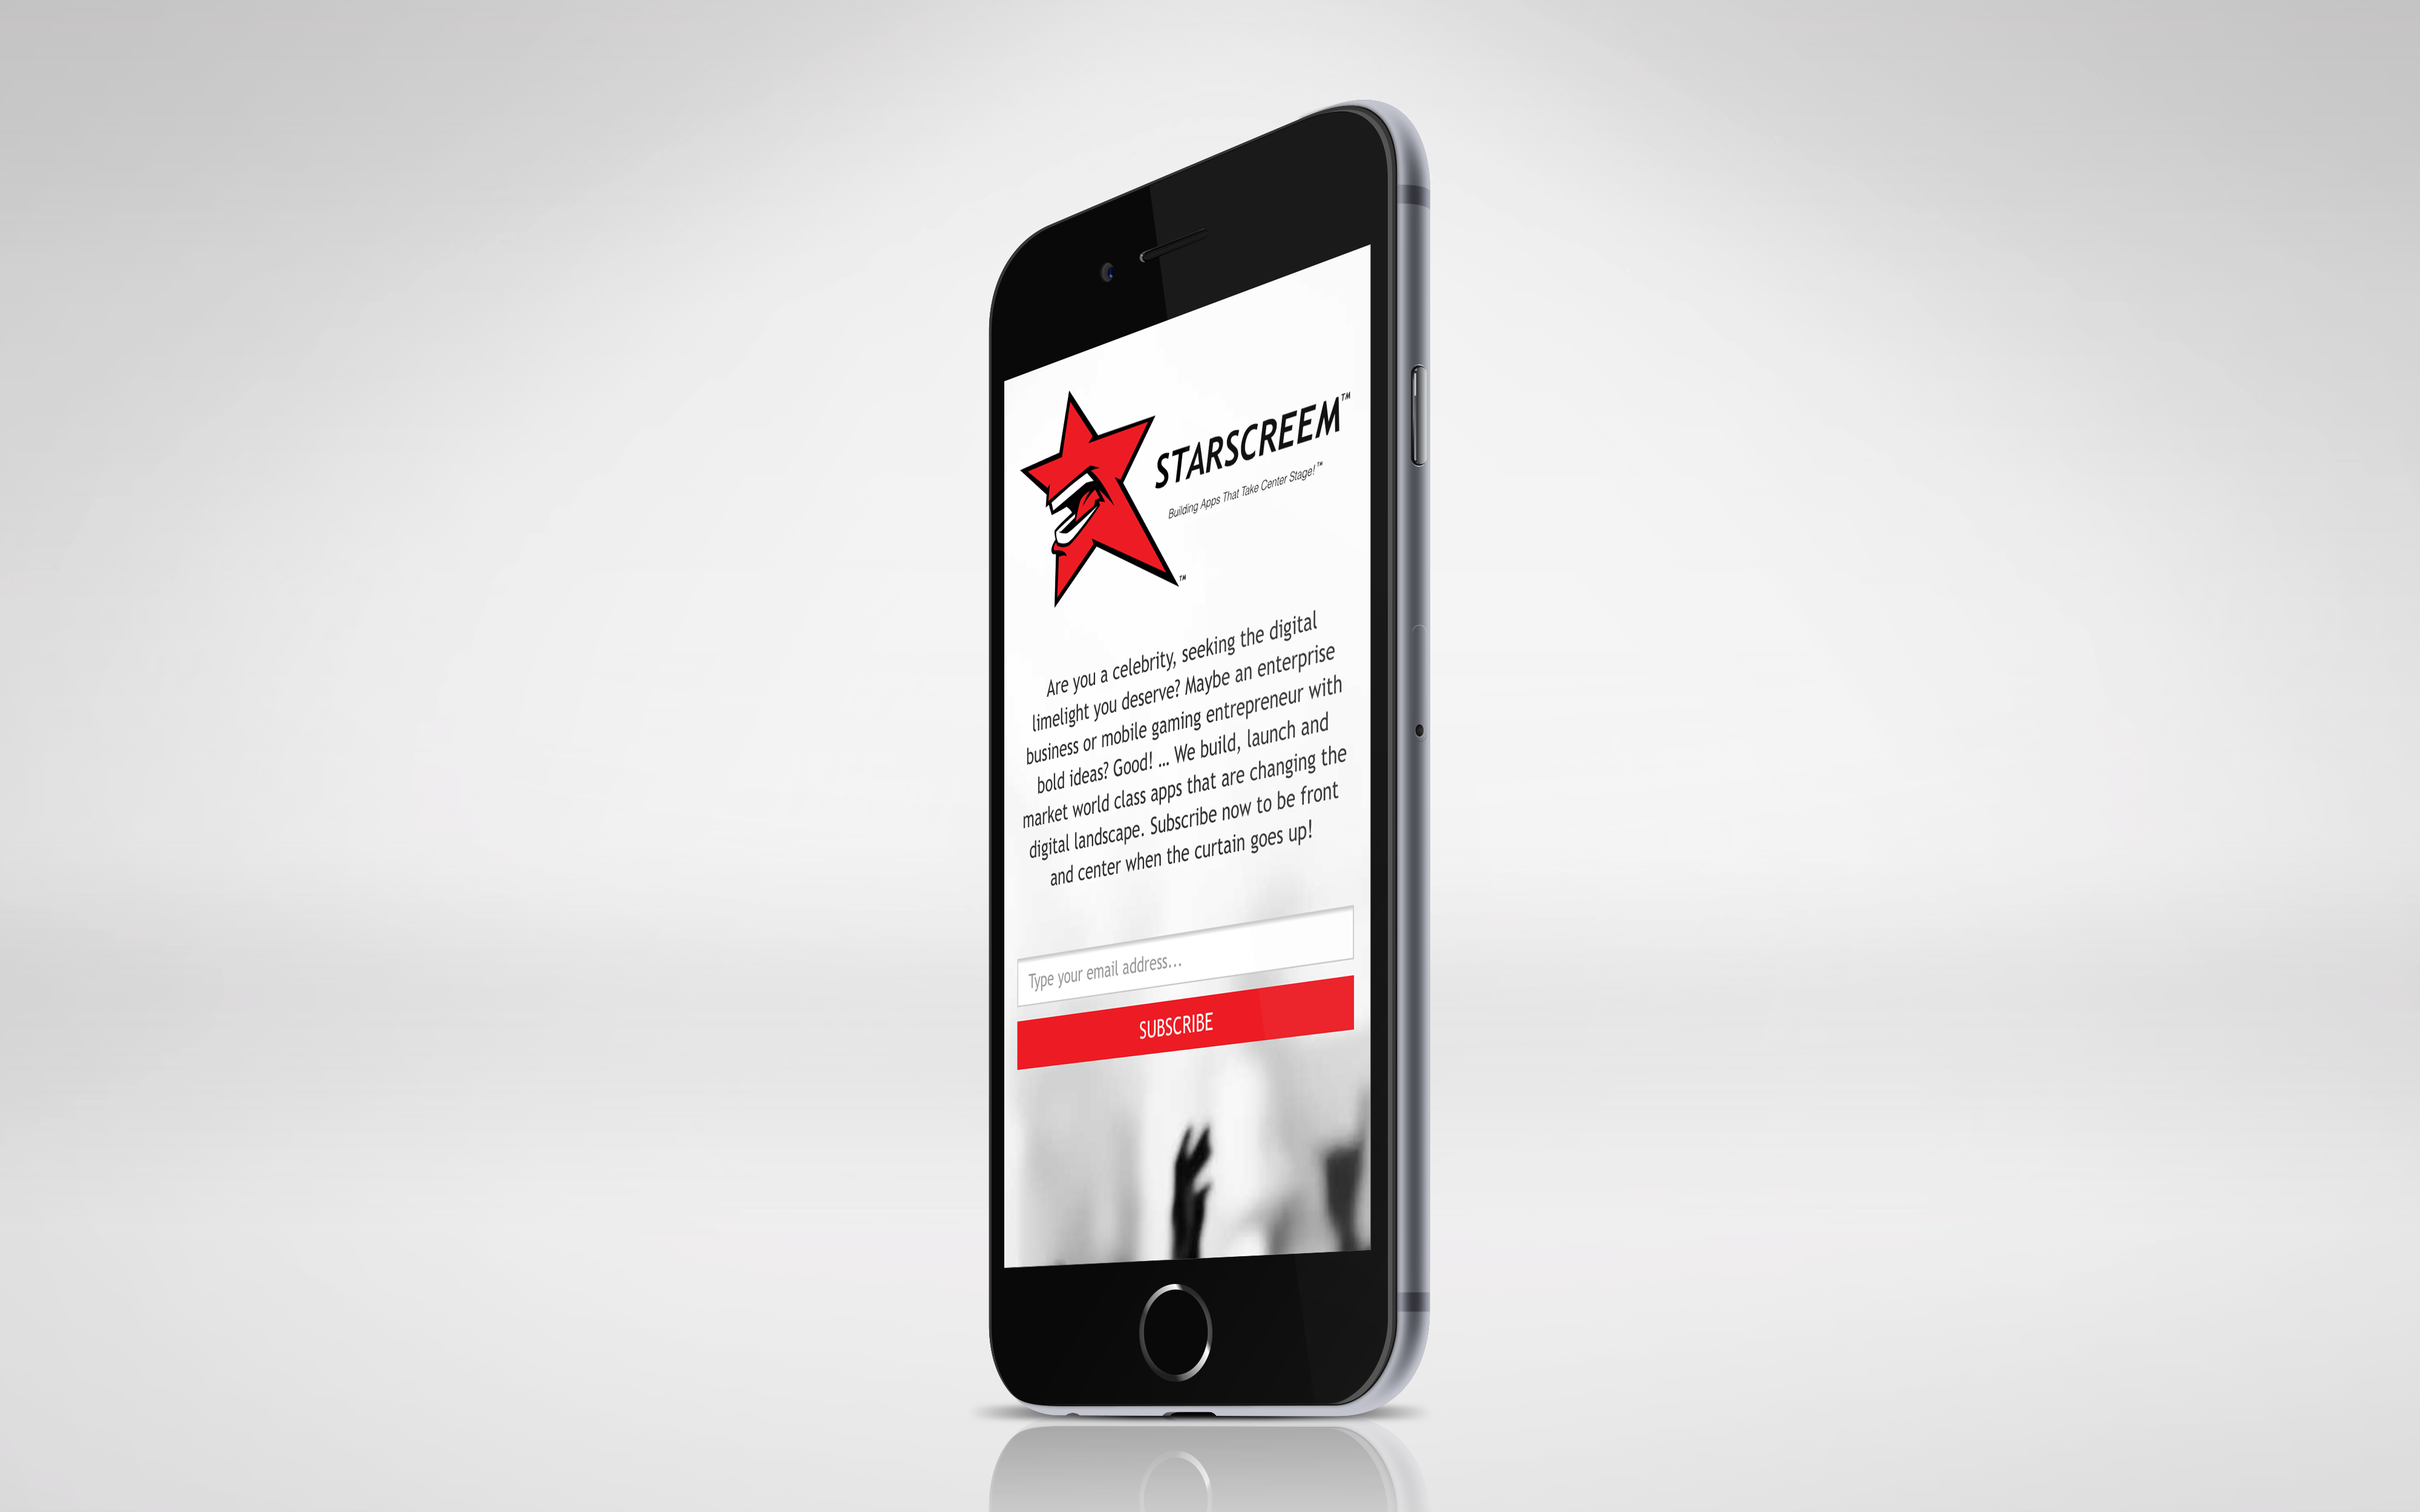 Starscreem_Website_Phone